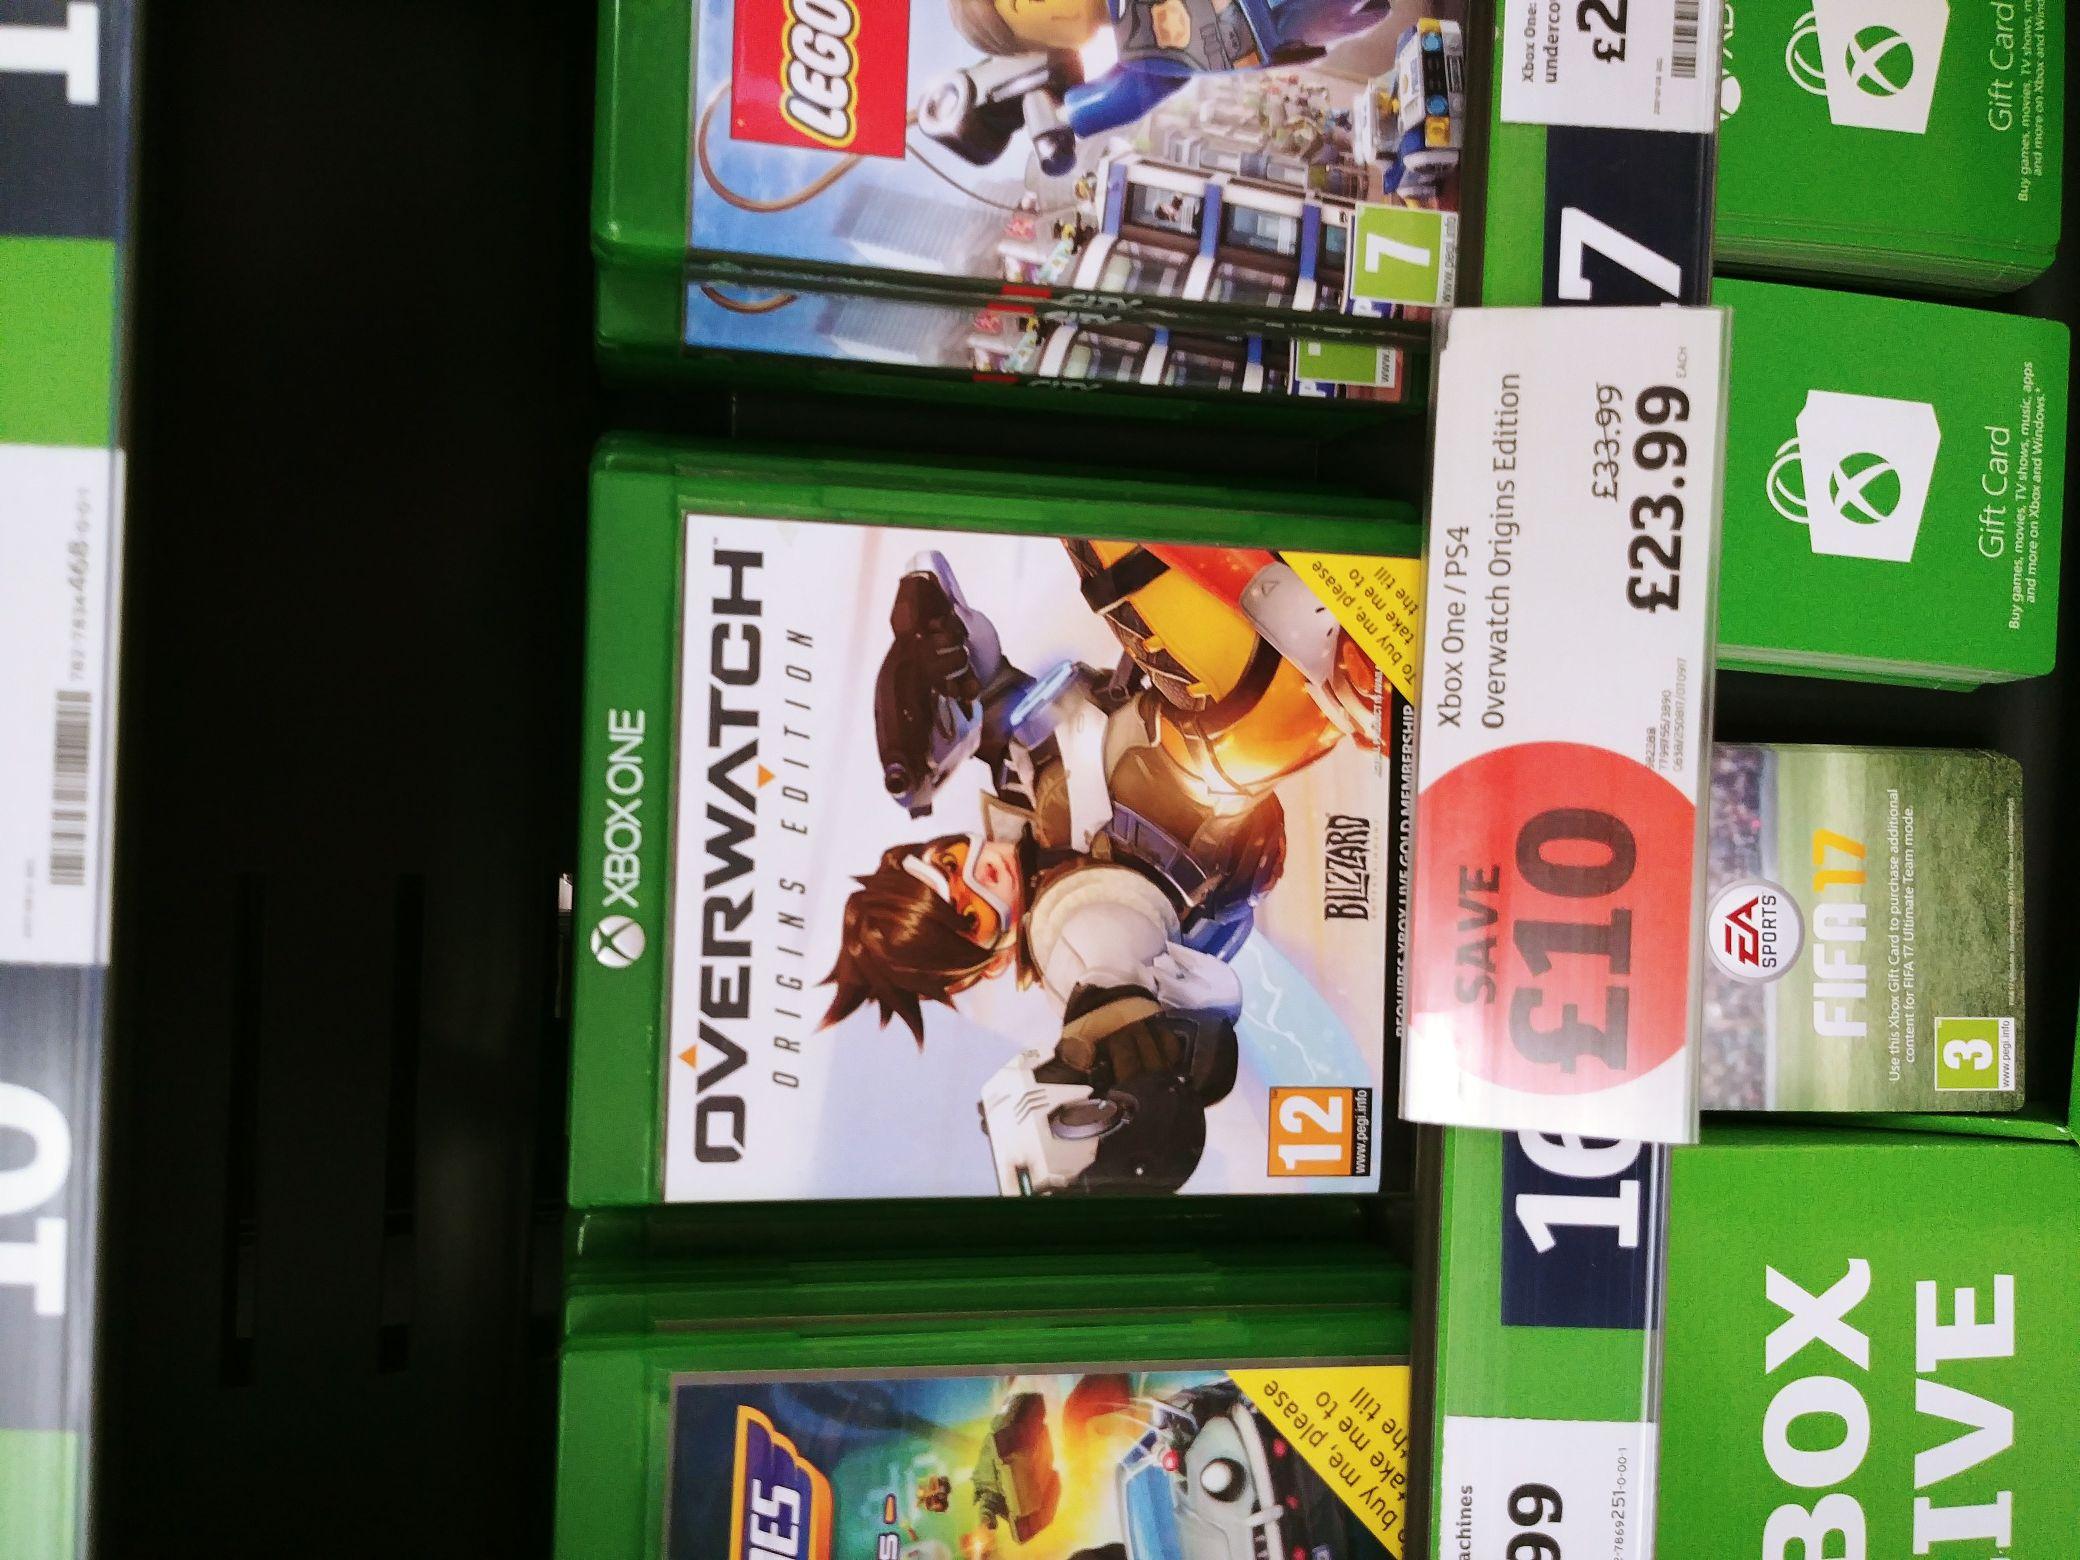 Overwatch Xbox One - Sainsburys (instore) - £23.99